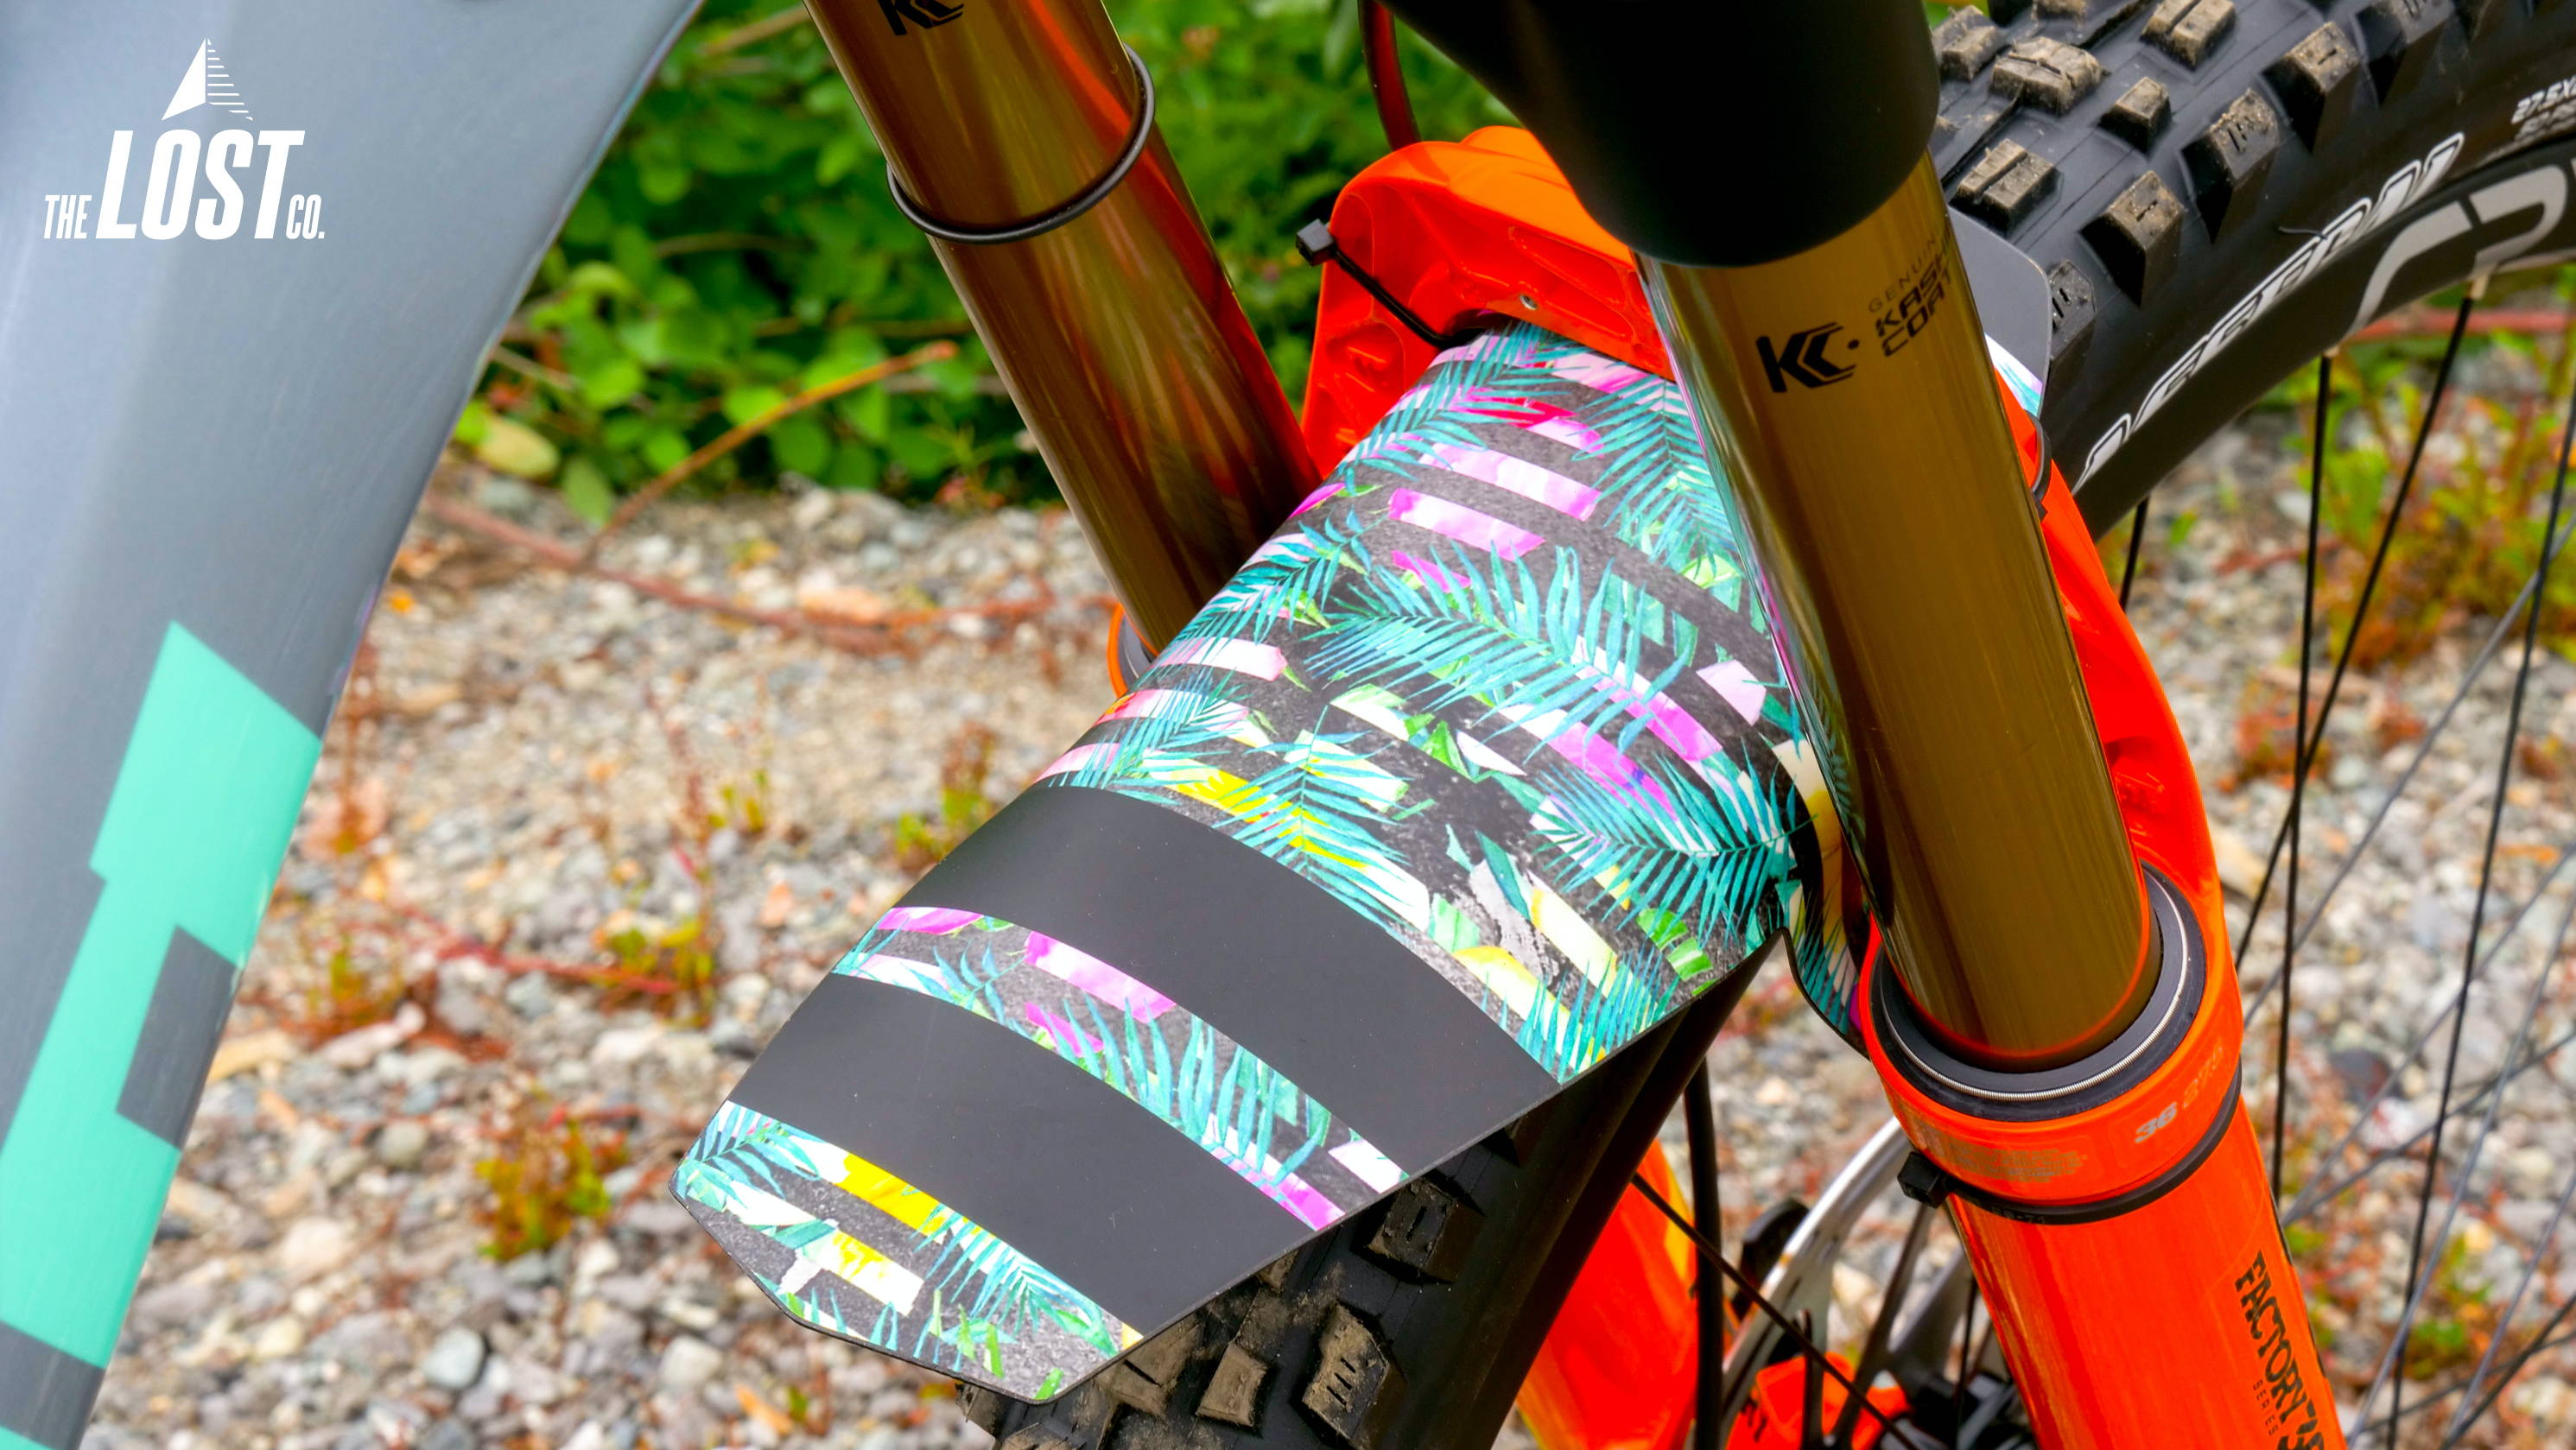 ground keeper groundskeeper groundkeeper fender mountain bike fenders staycation custom fox 36 orange